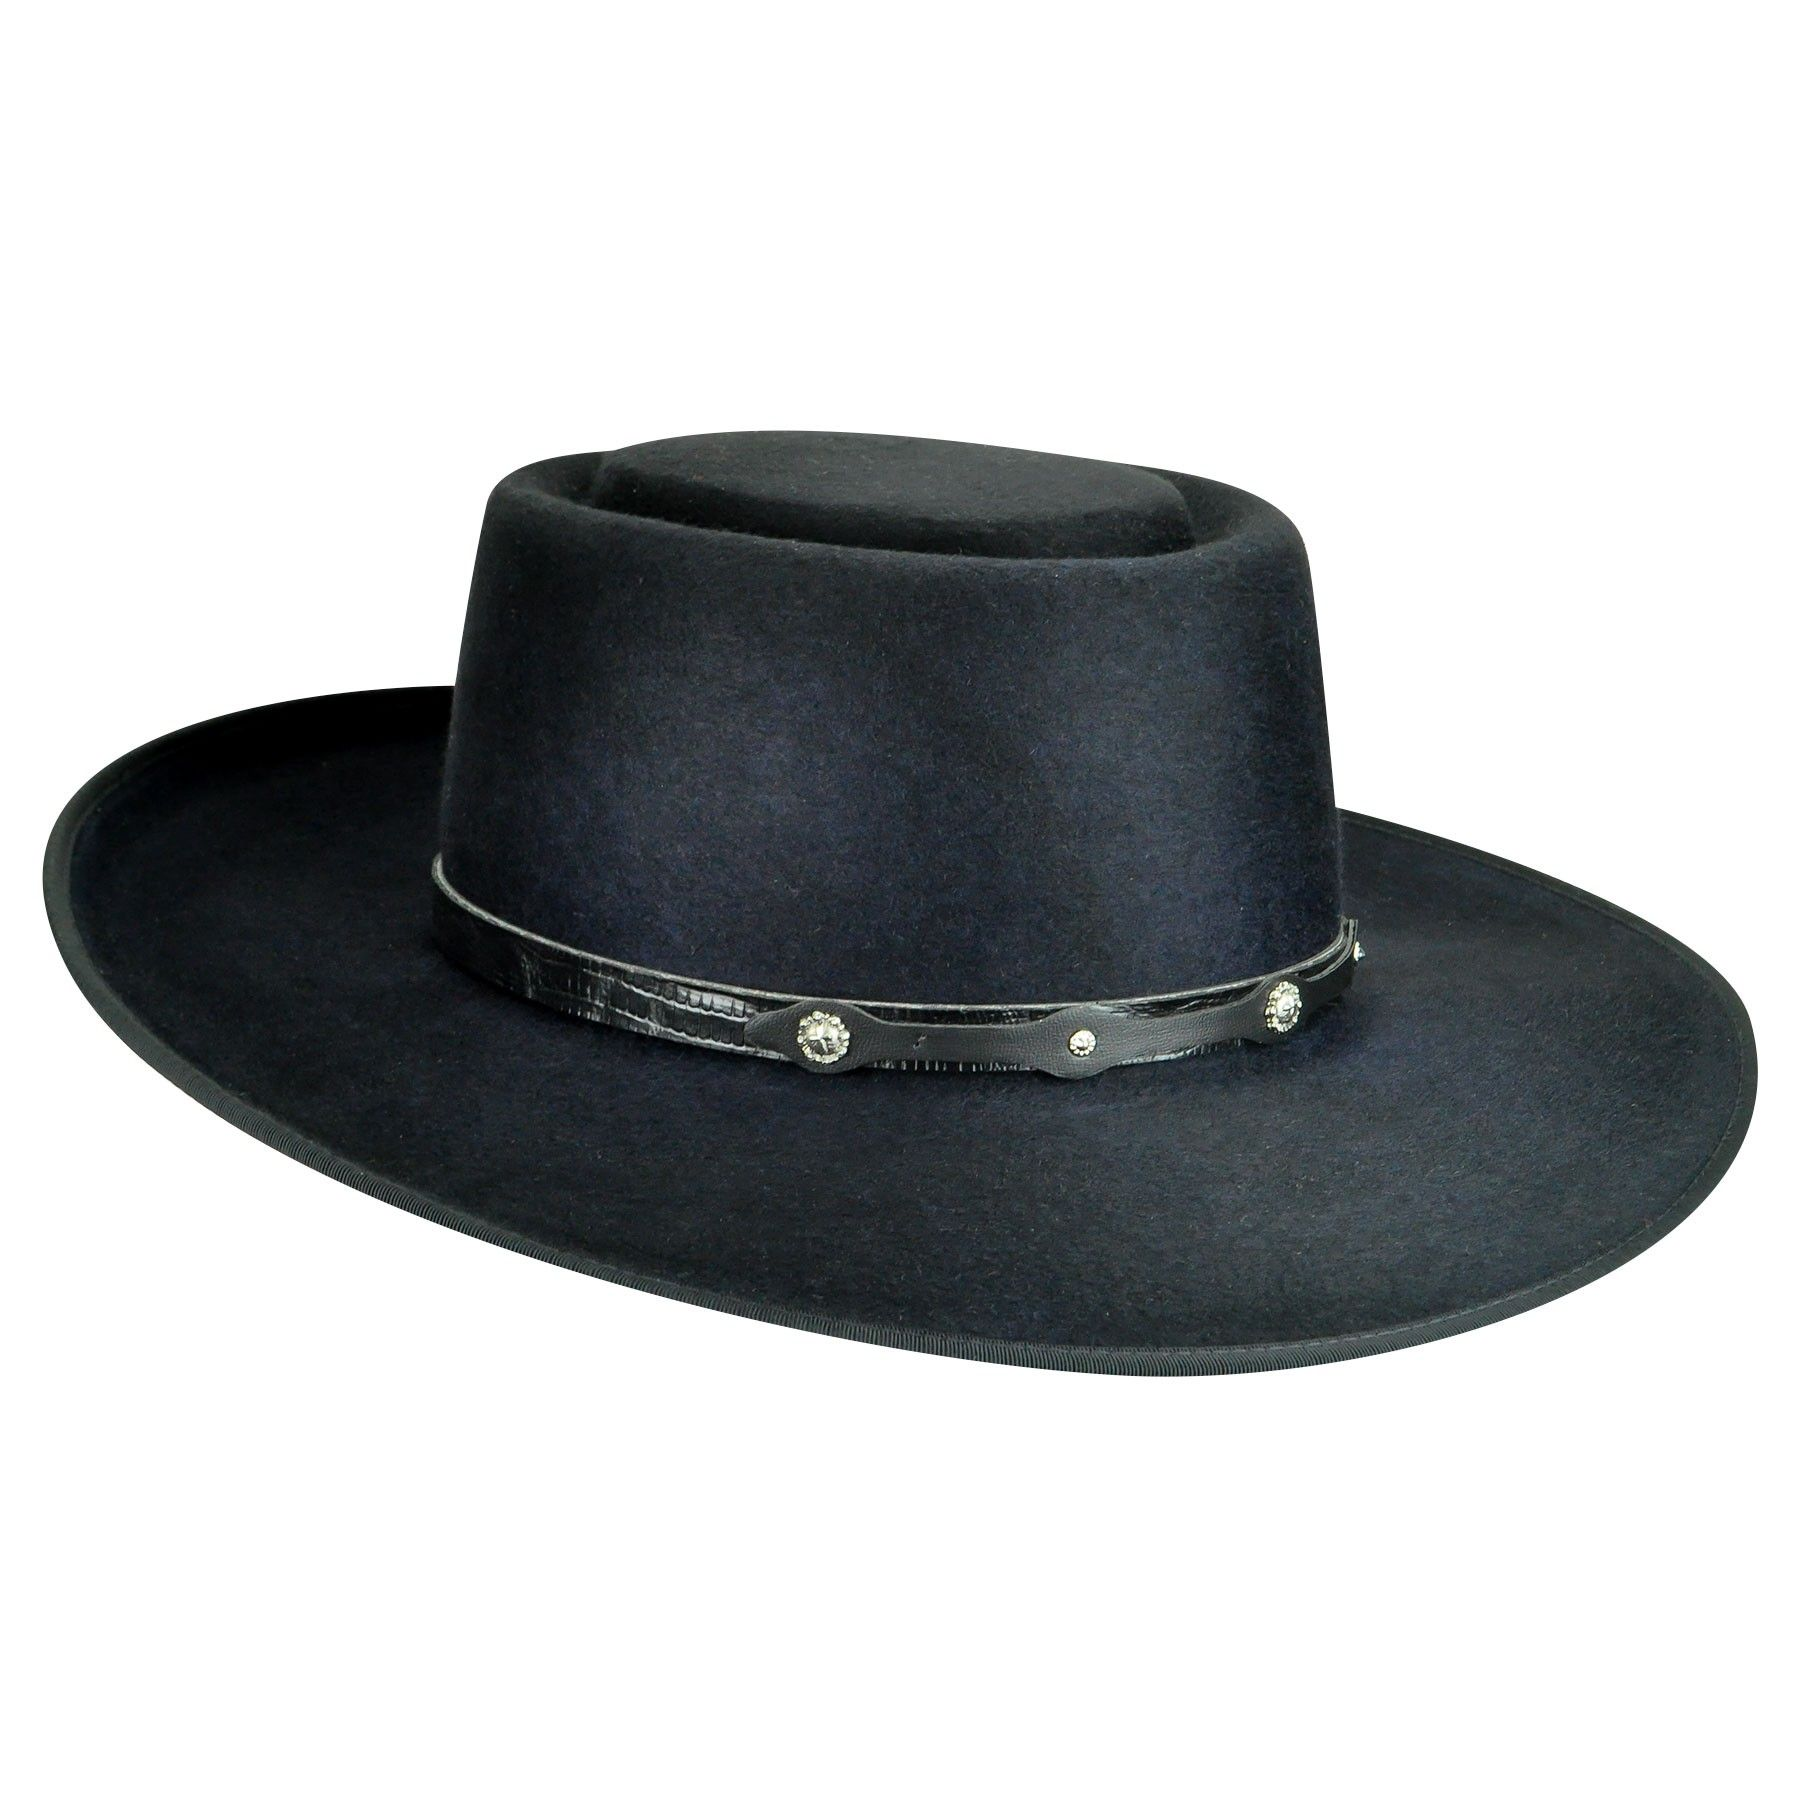 Renegade by Bailey® Bianco Western Hat - hats.com  b8d91eca10ef